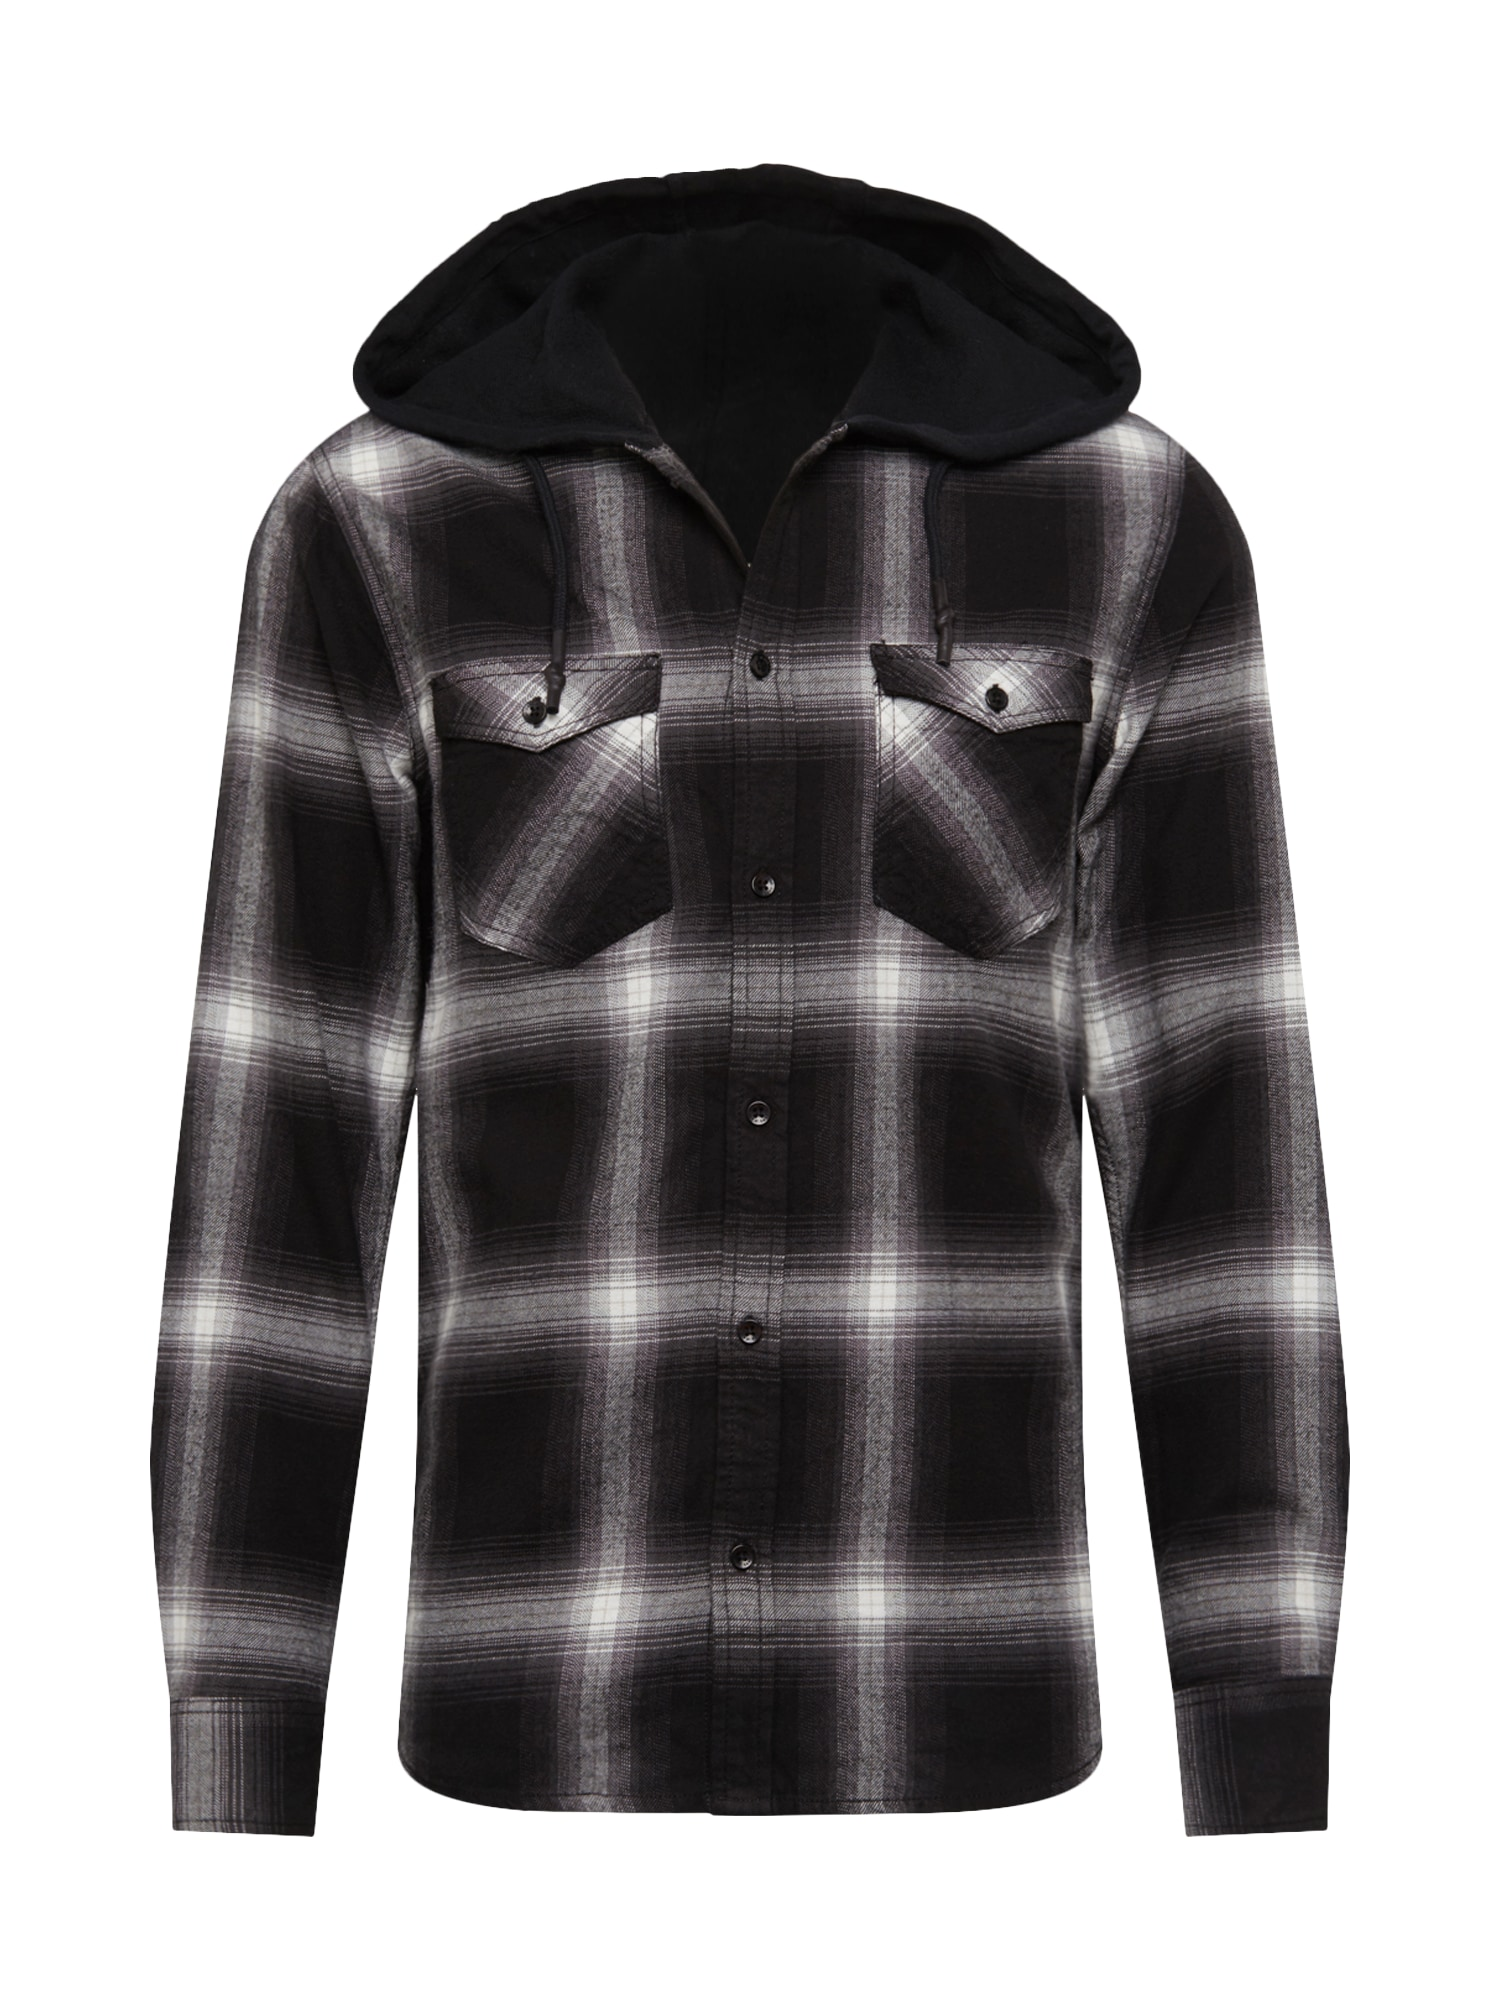 Cars Jeans Košile 'CHANDON'  černá / bílá / šedá / tmavě šedá